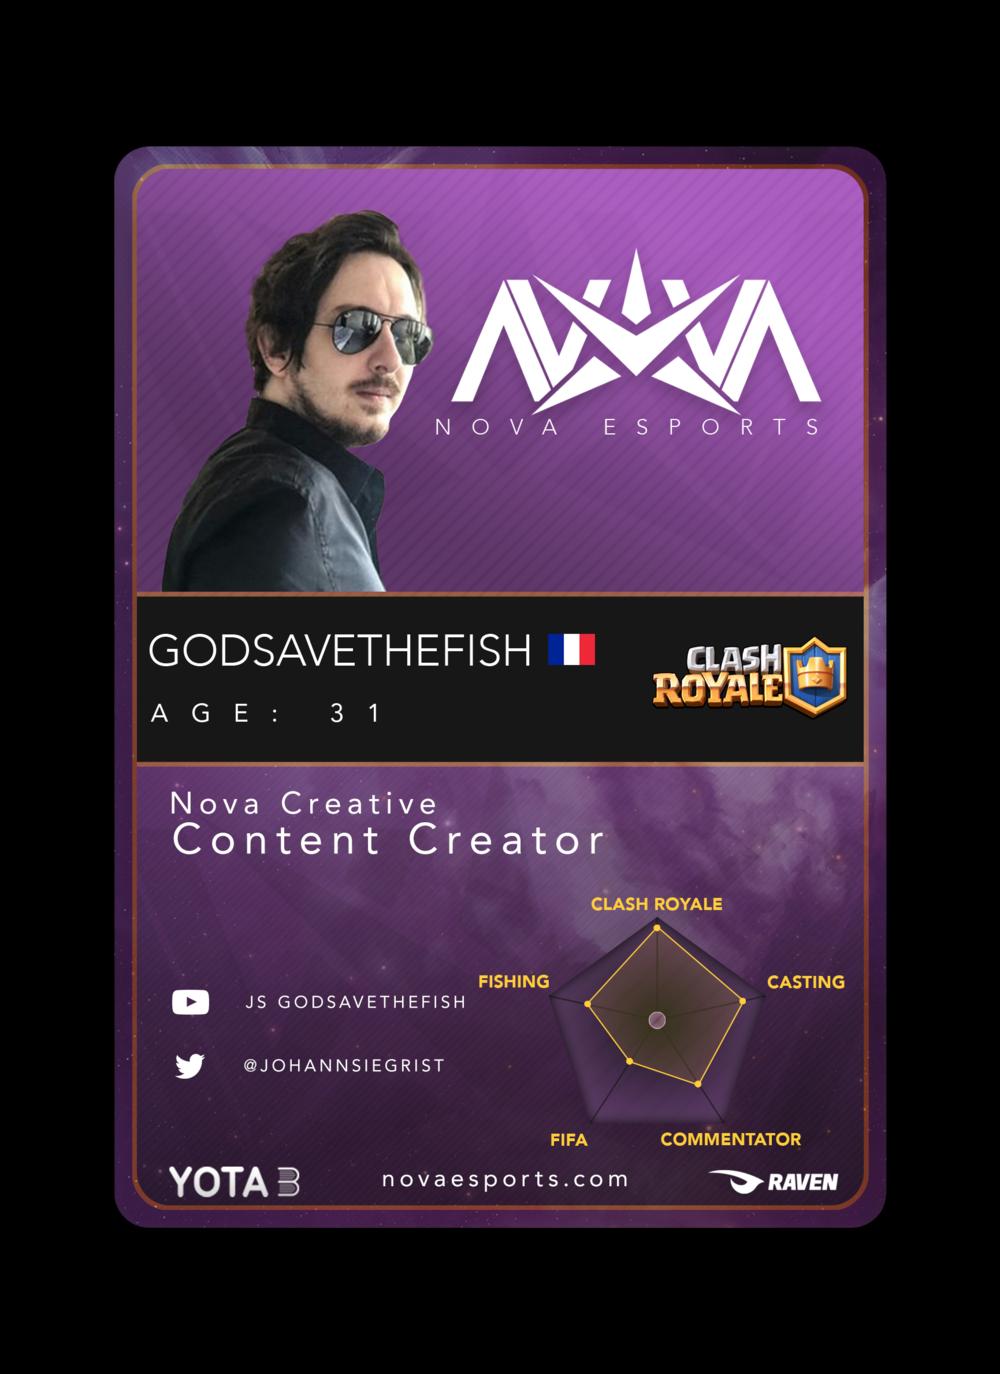 playercard_websitemockup_godsavethefishplayercard_vertical.png